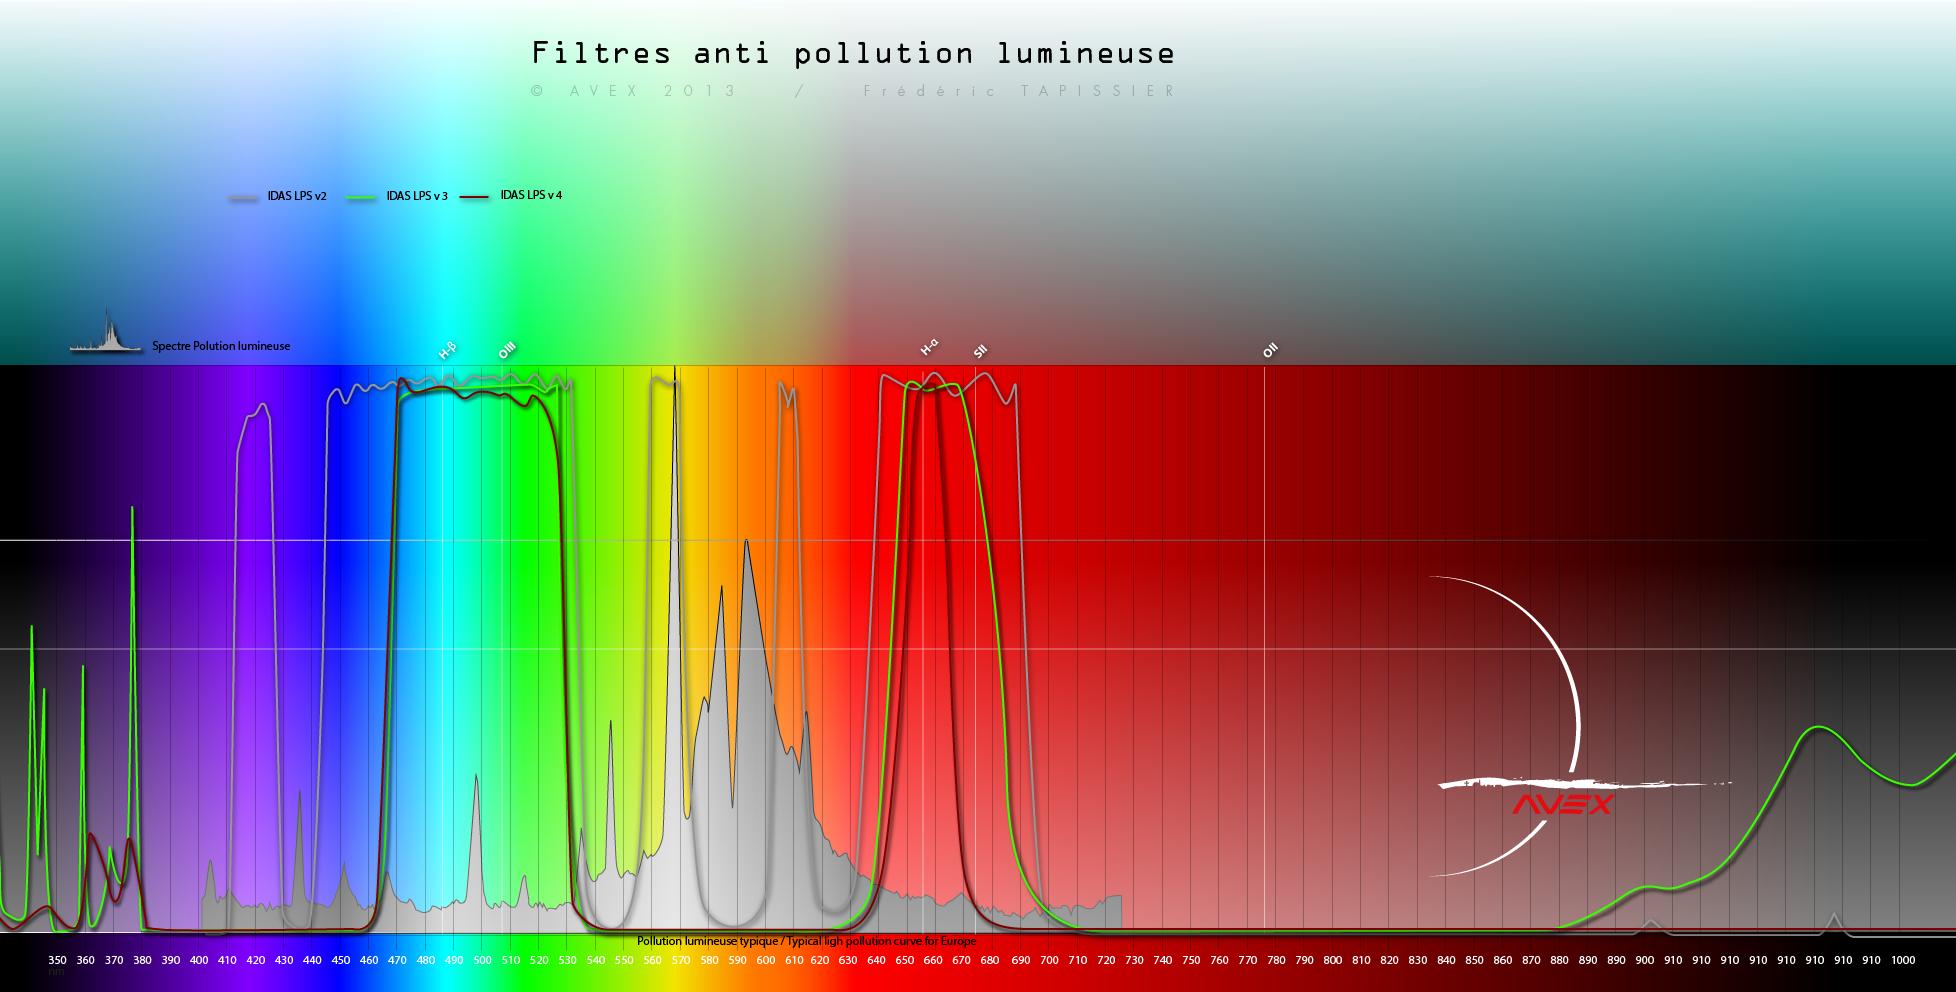 Filtre anti-pollution IDAS-LPS-D1 736431spectrefiltreavex6